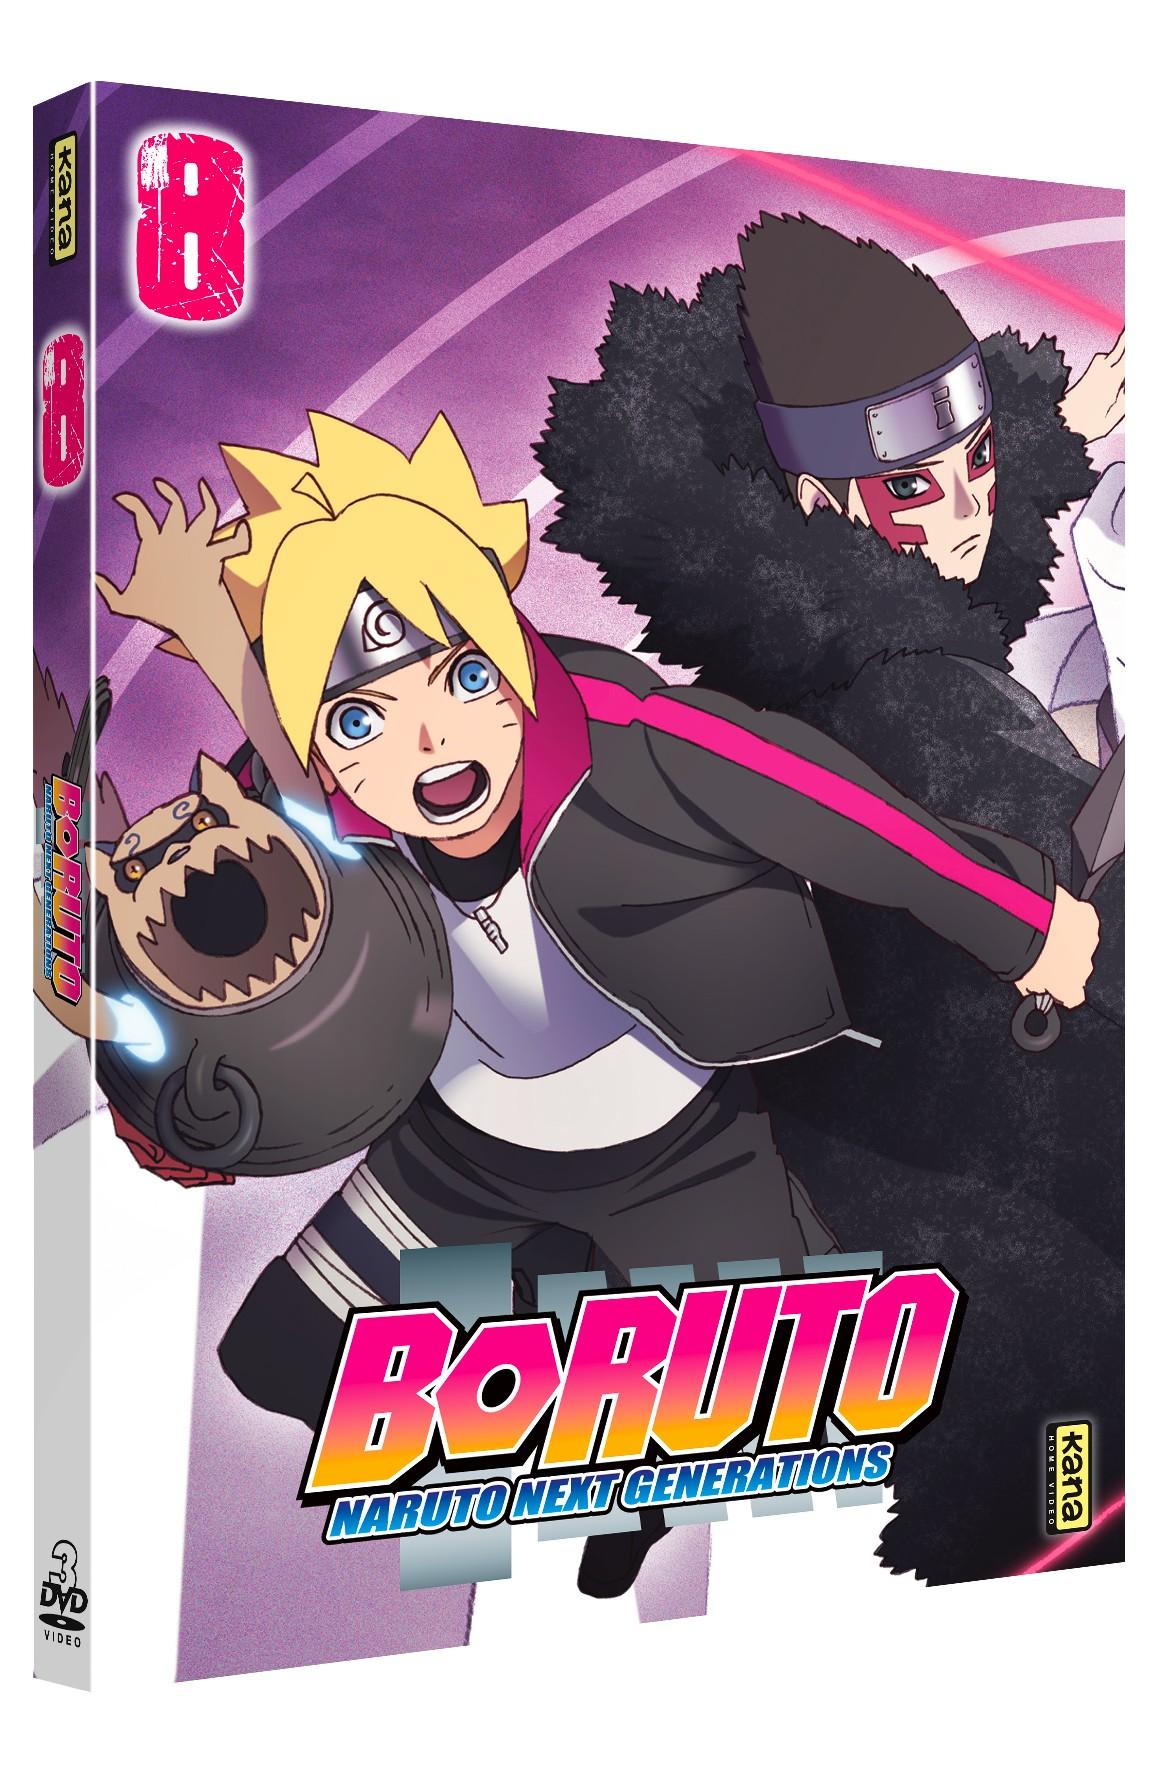 BORUTO NARUTO NEXT GENERATIONS VOL 8 - 3 DVD